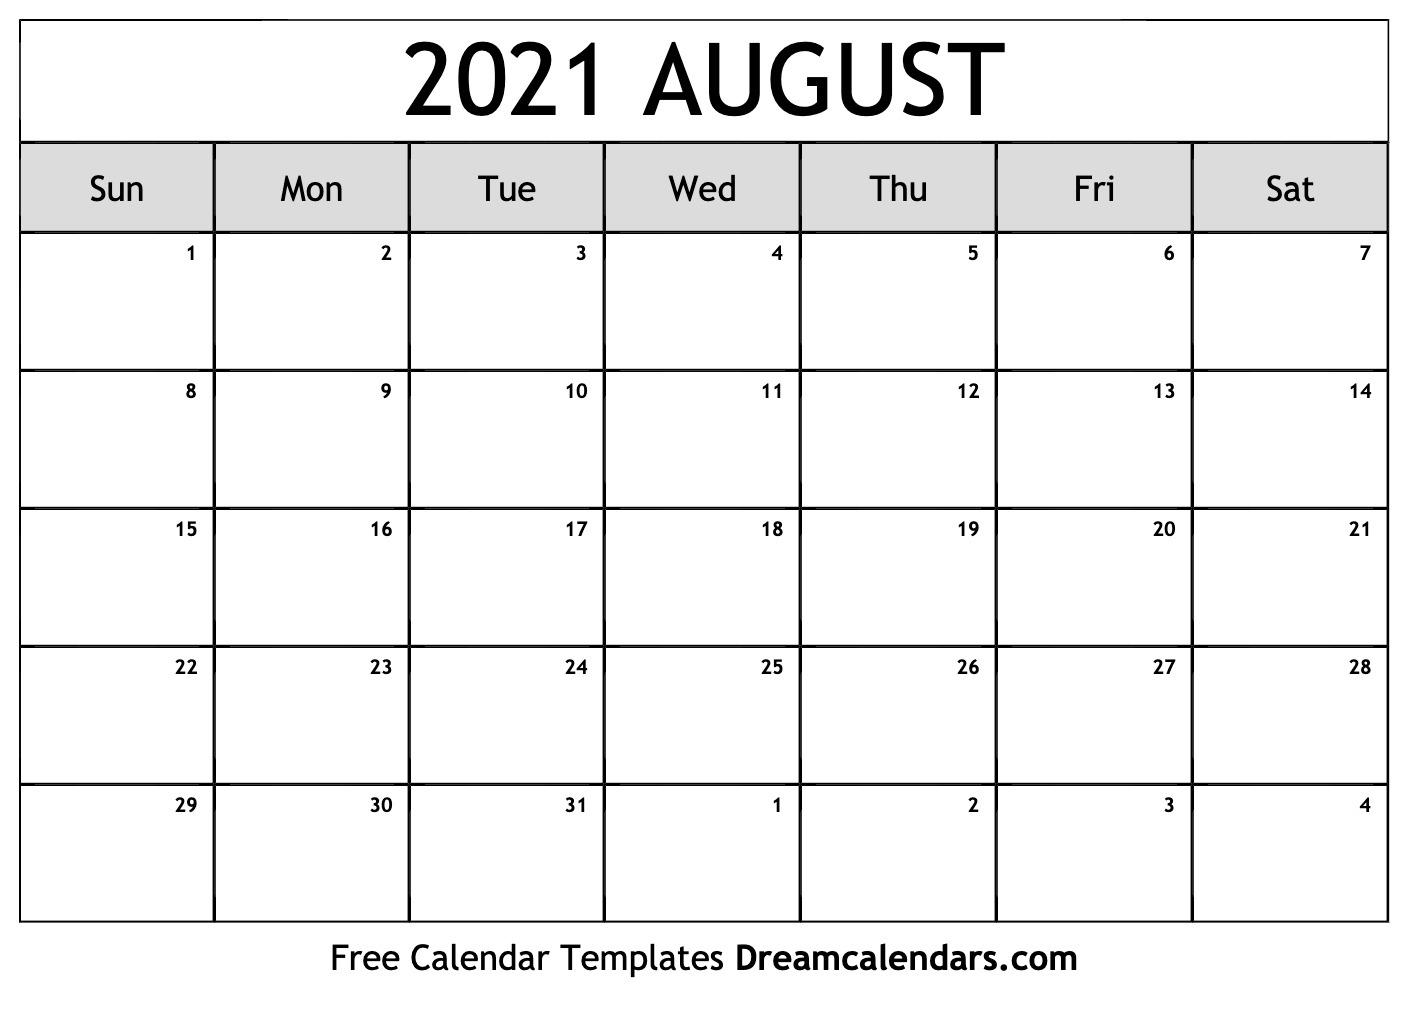 August 2021 Calendar | Free Blank Printable Templates August 2021 Template Calendar